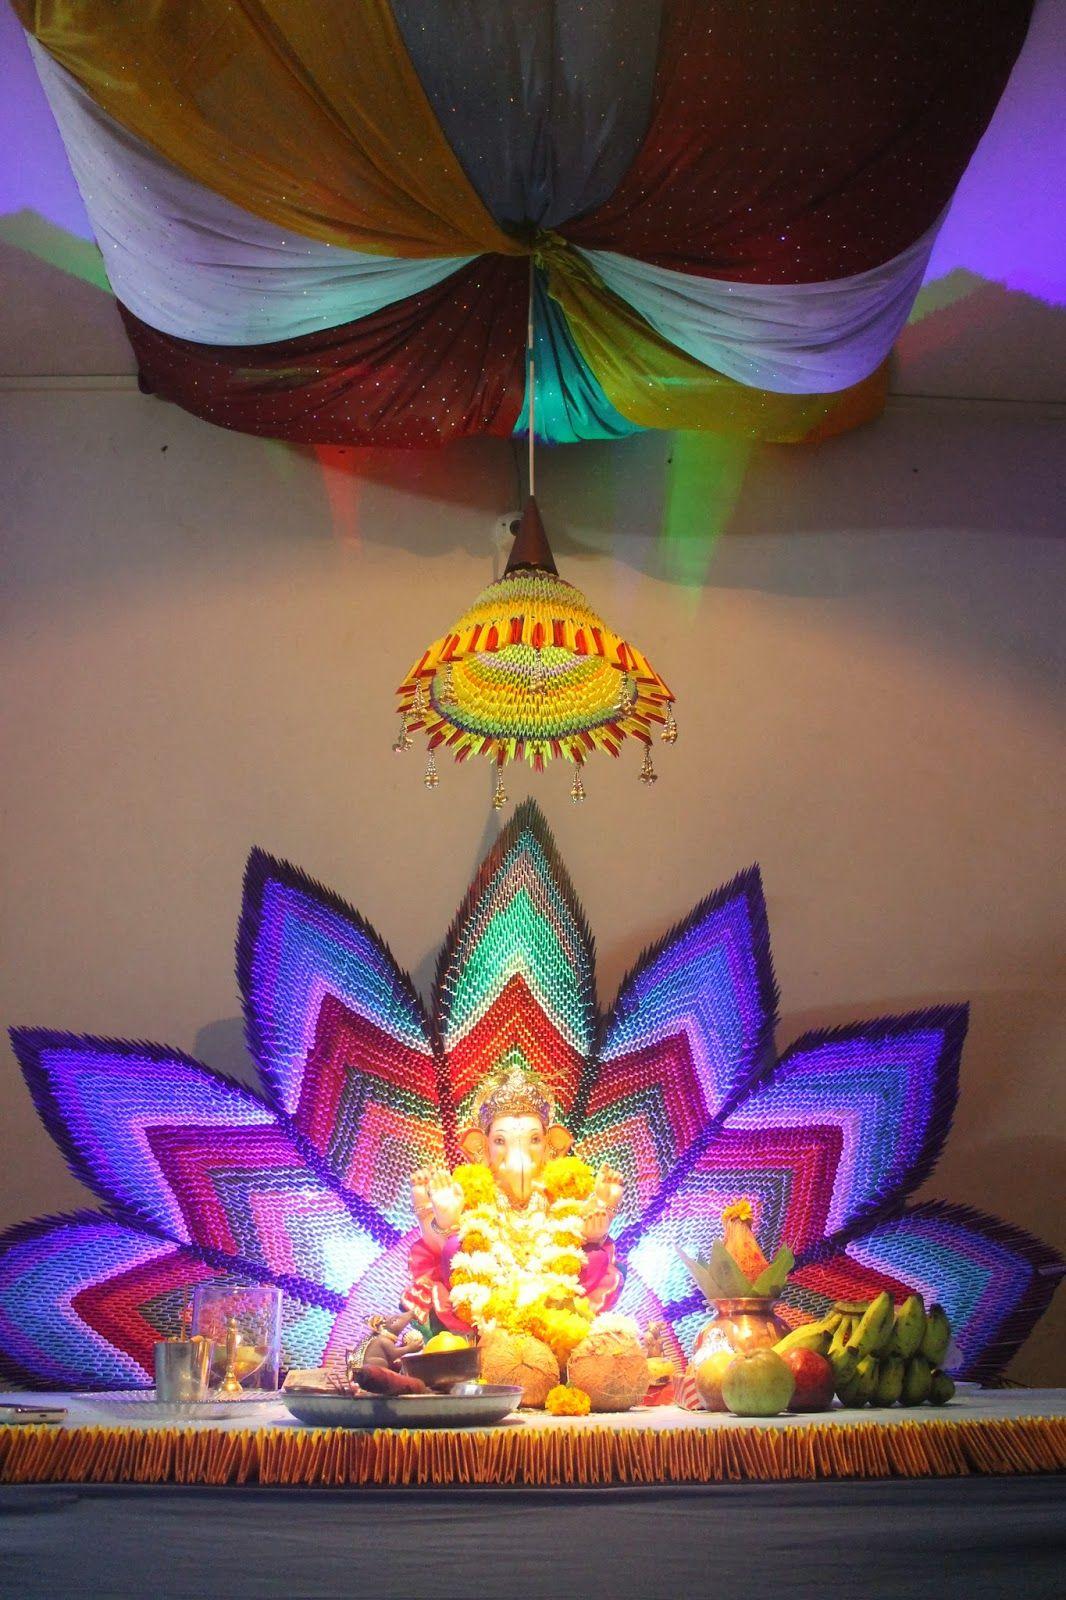 Ganpati decoration jungle theme for Ganpati decorations ideas at home